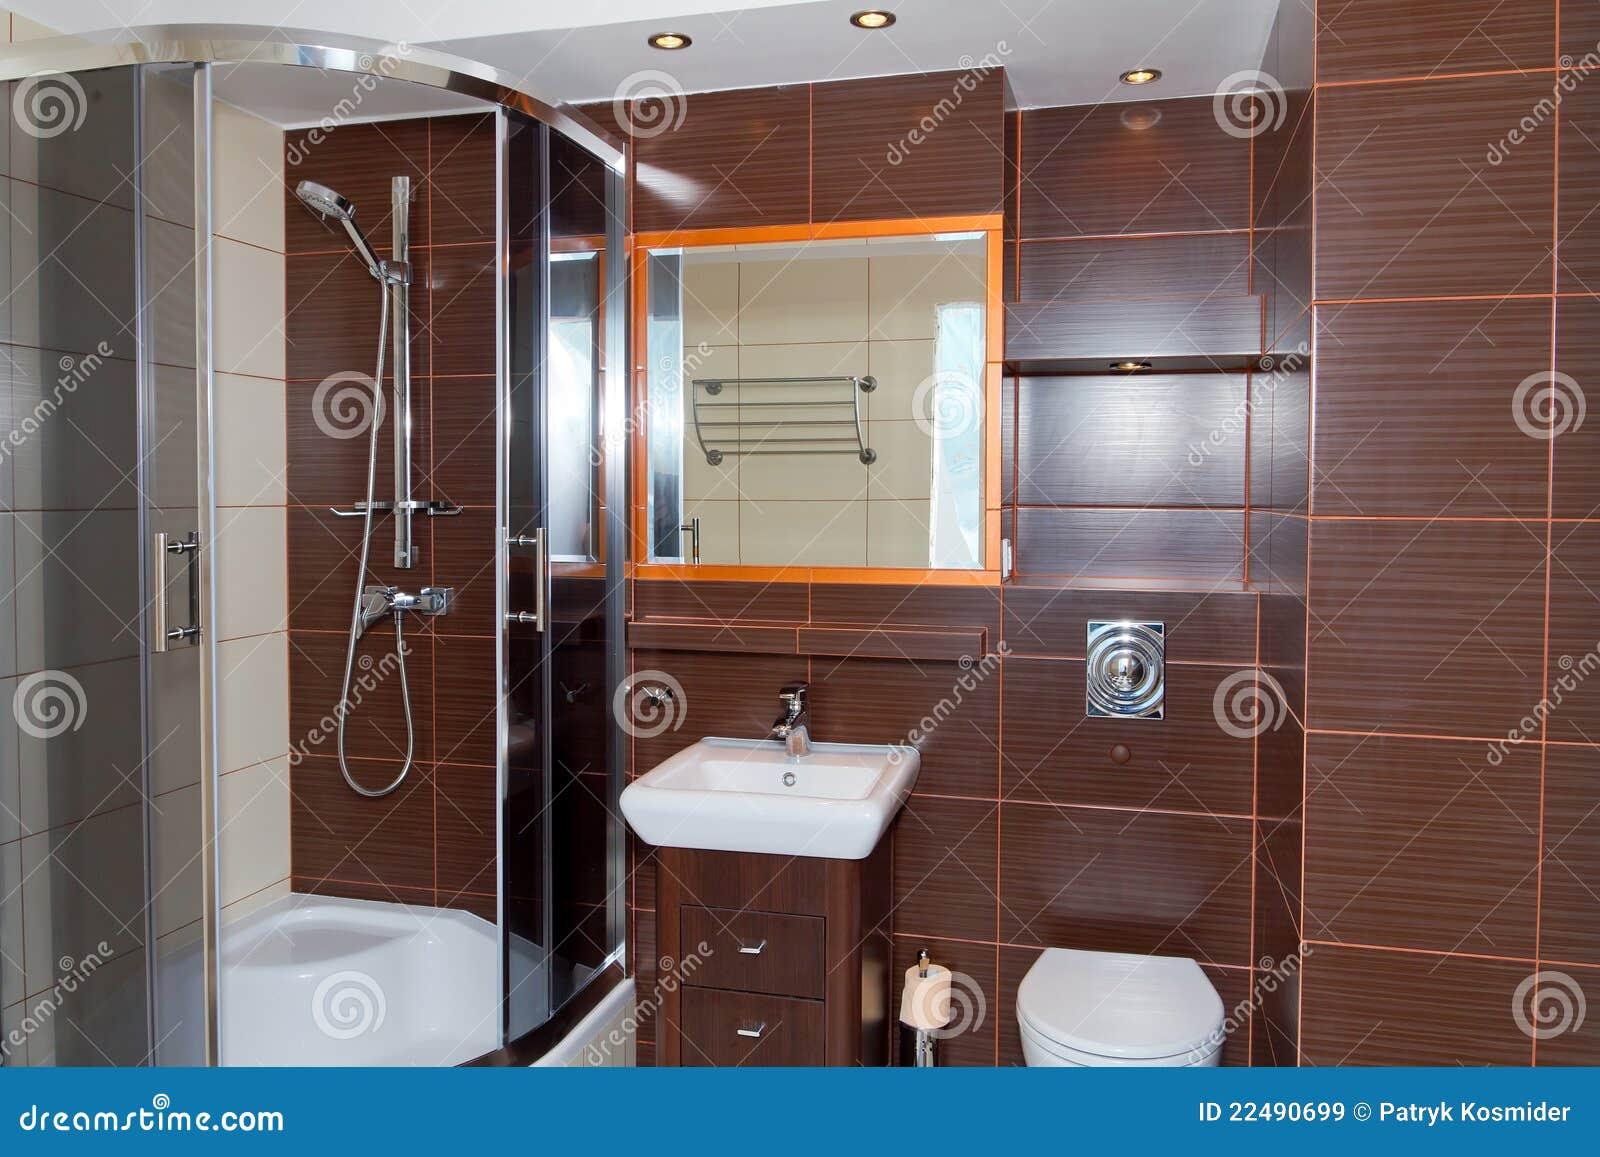 dark brown bathroom interior royalty free stock images - image